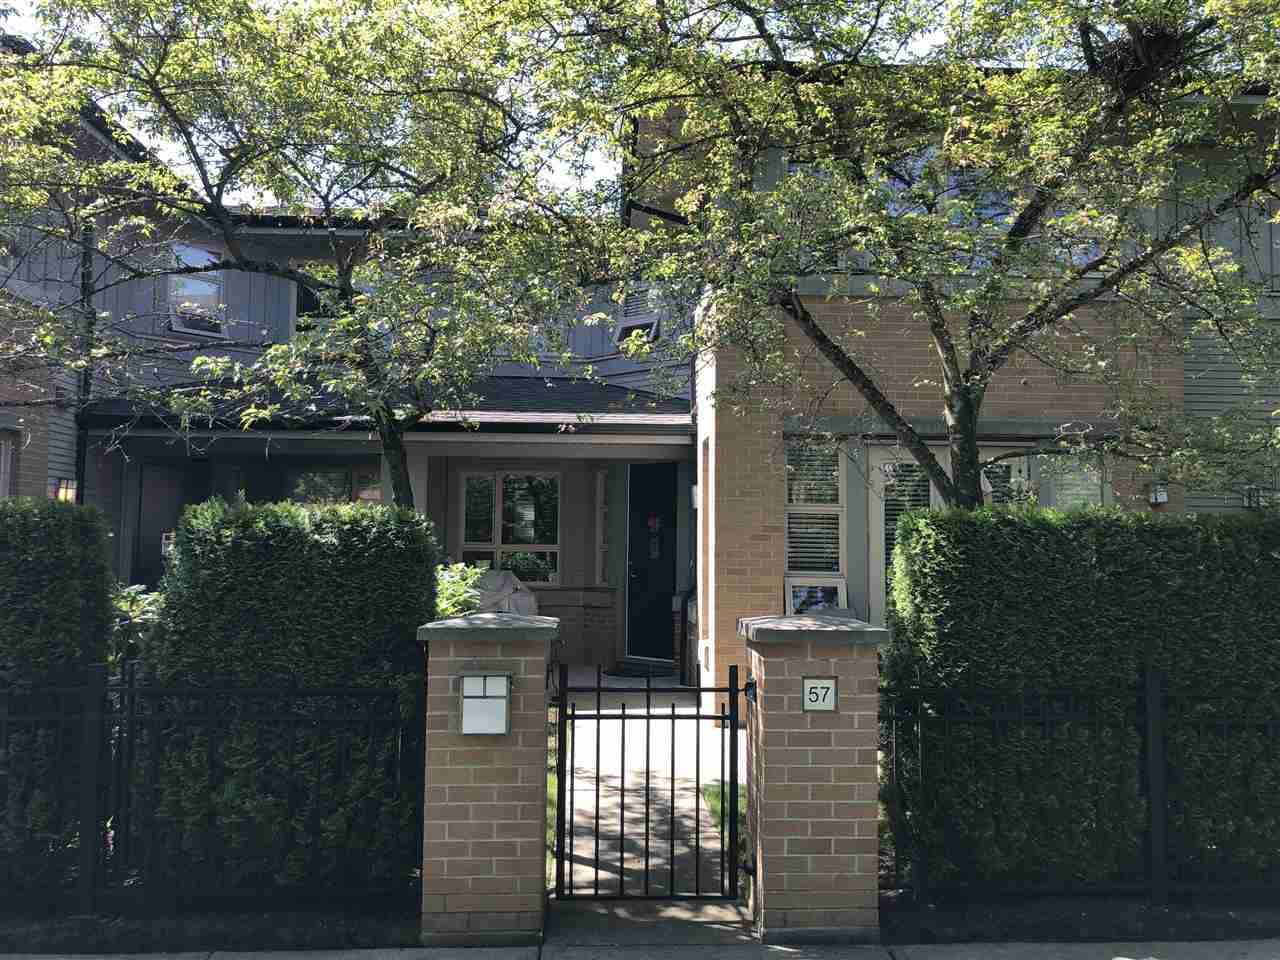 Main Photo: 57 6300 BIRCH Street in Richmond: McLennan North Townhouse for sale : MLS®# R2376593